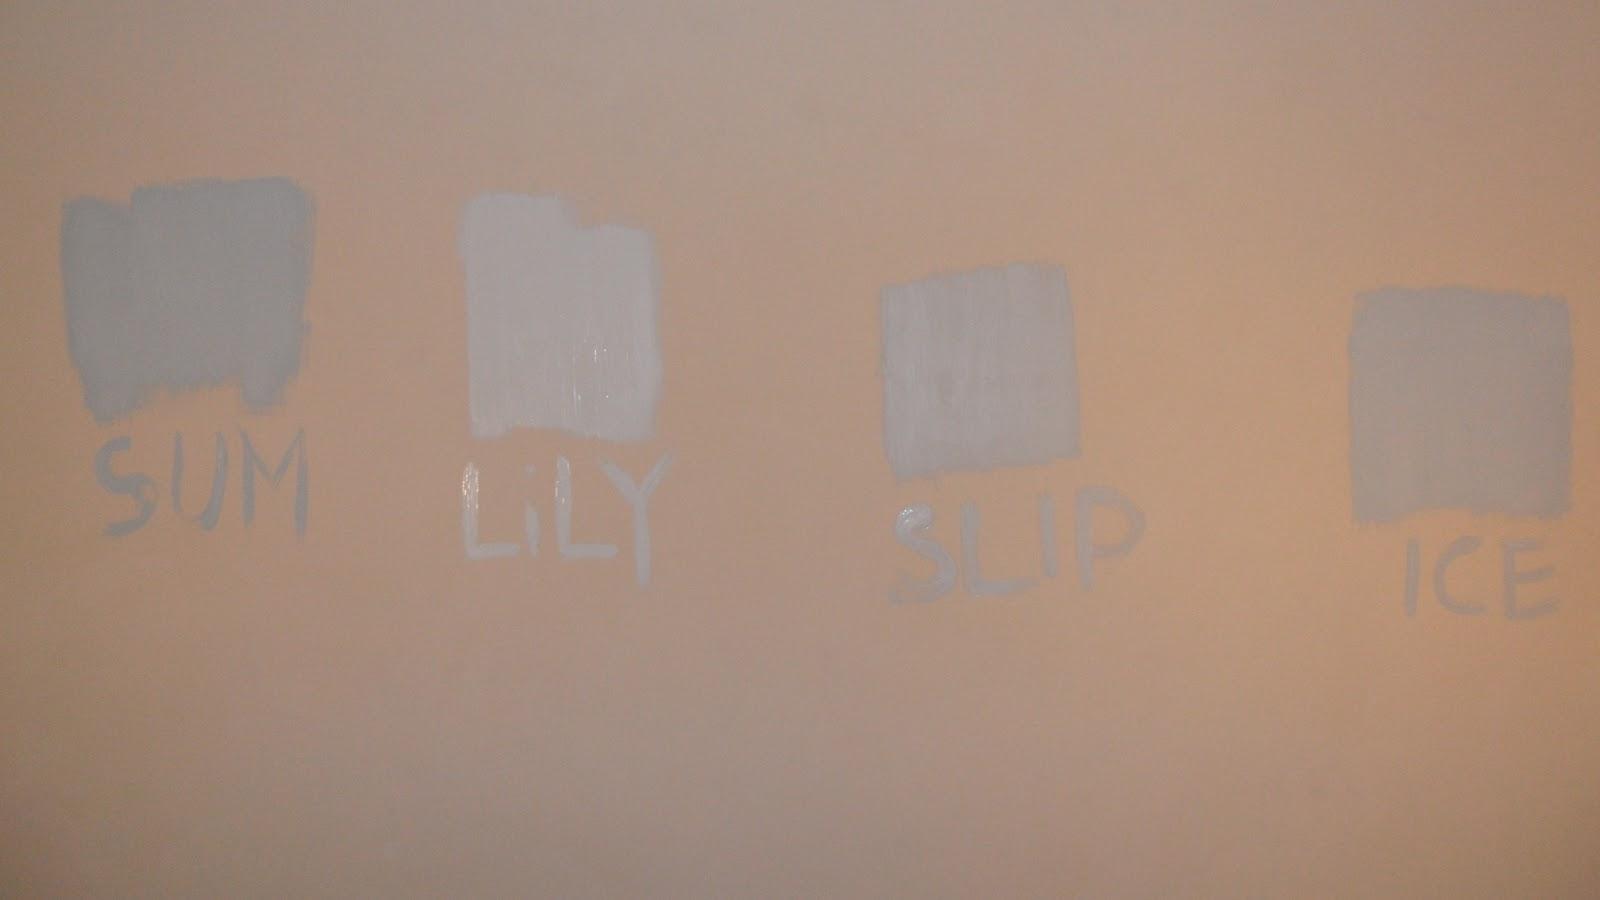 Dandelion Paperweight Paint Finally